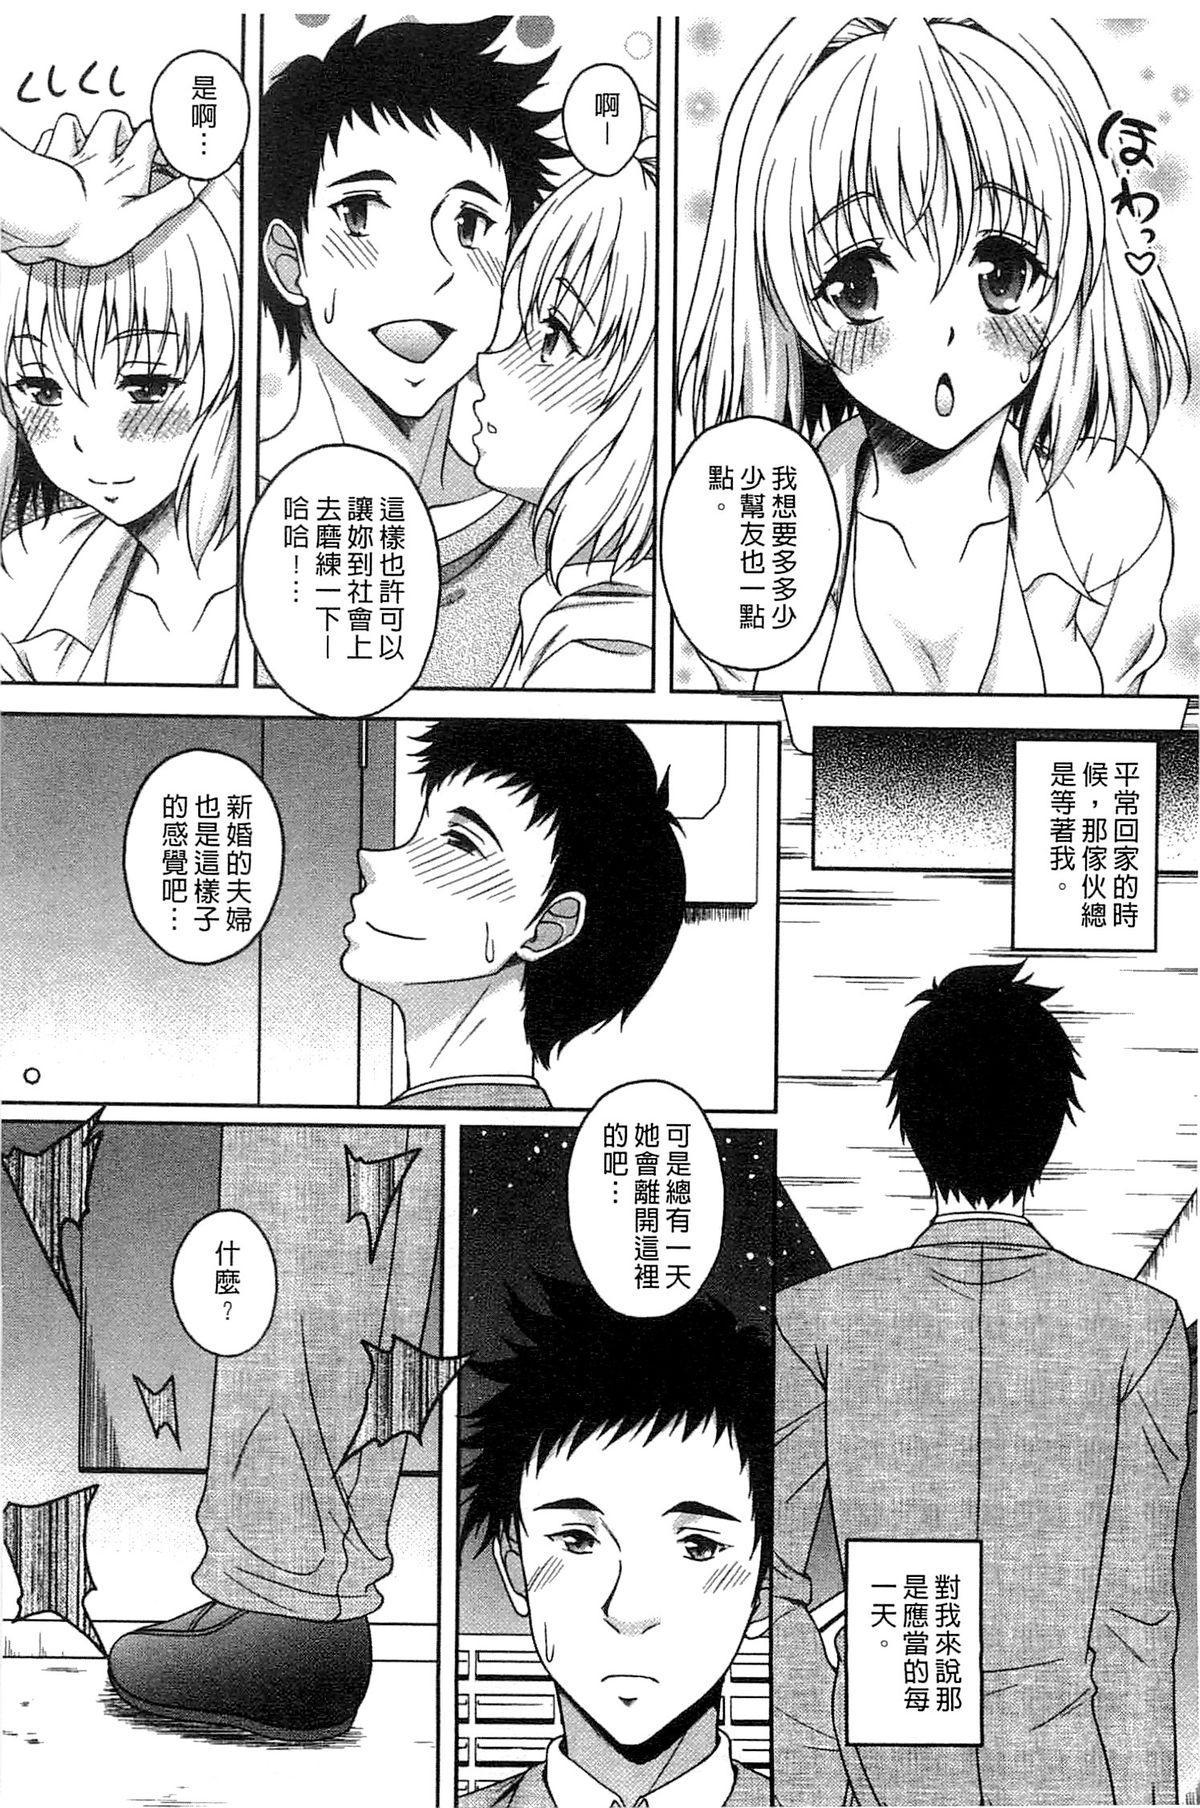 Hajimete nan dakara - First sexual experience 192